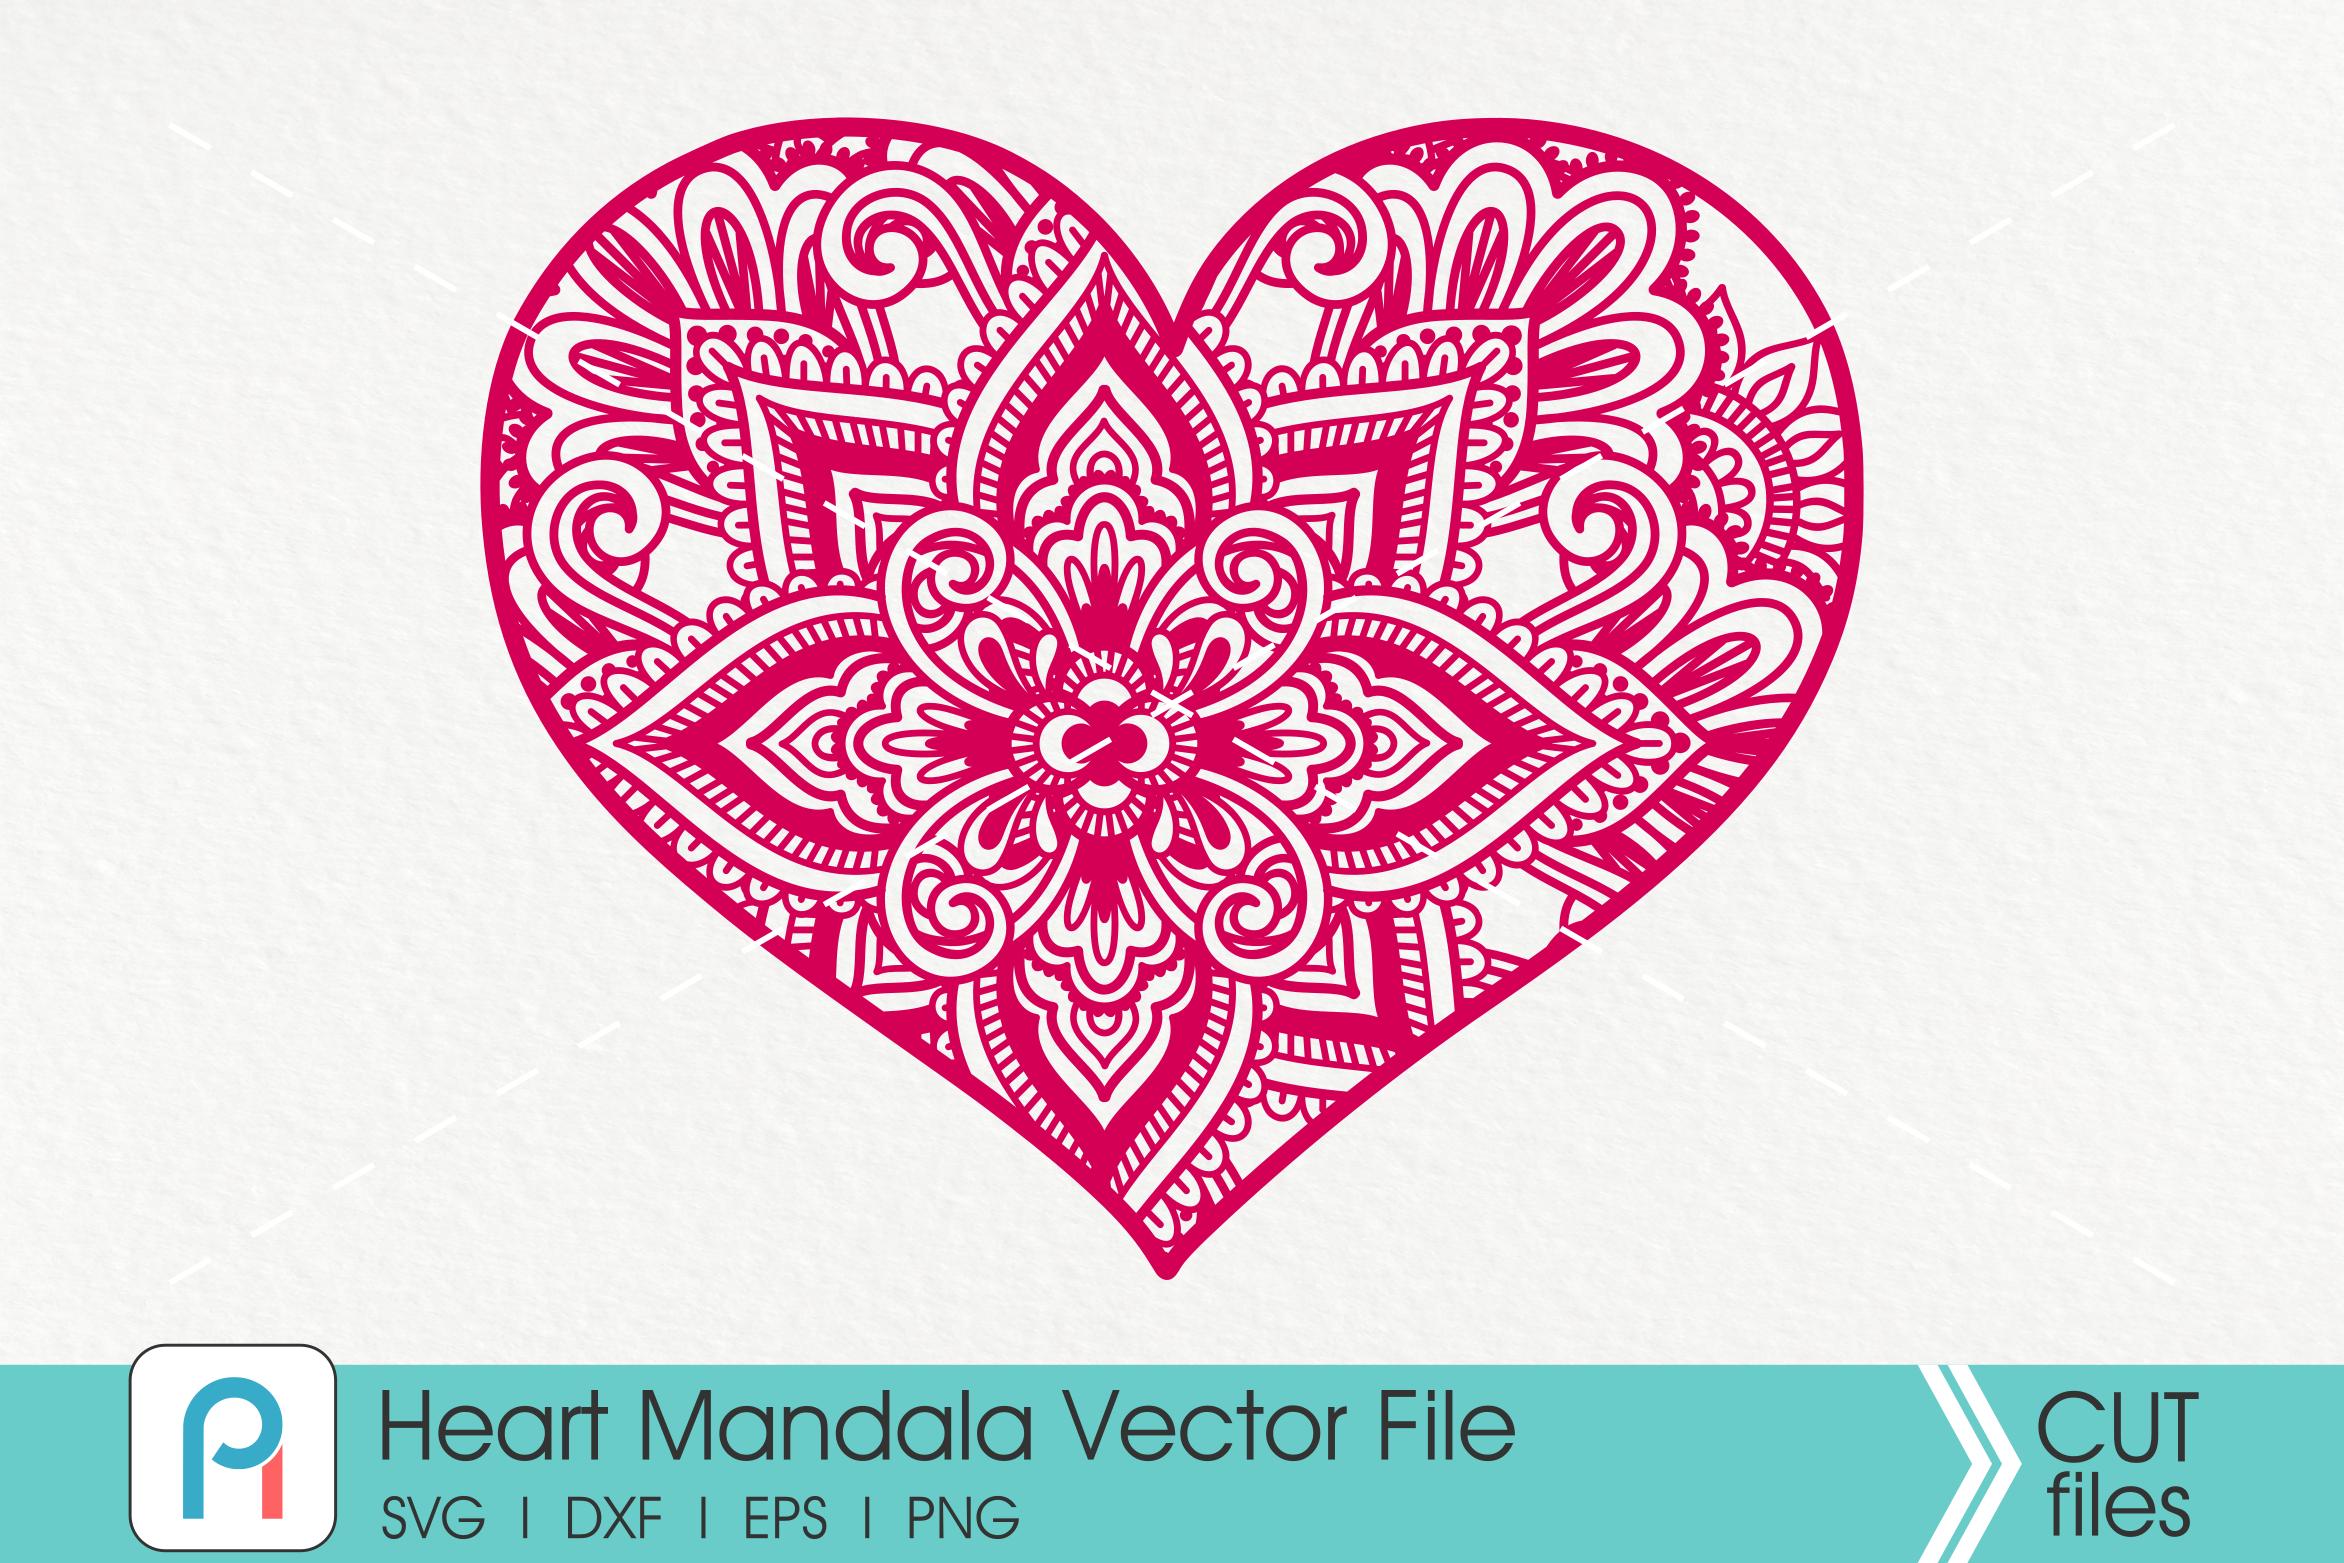 Heart Mandala Svg, Heart Svg, Zentangle Heart Svg, Heart example image 1